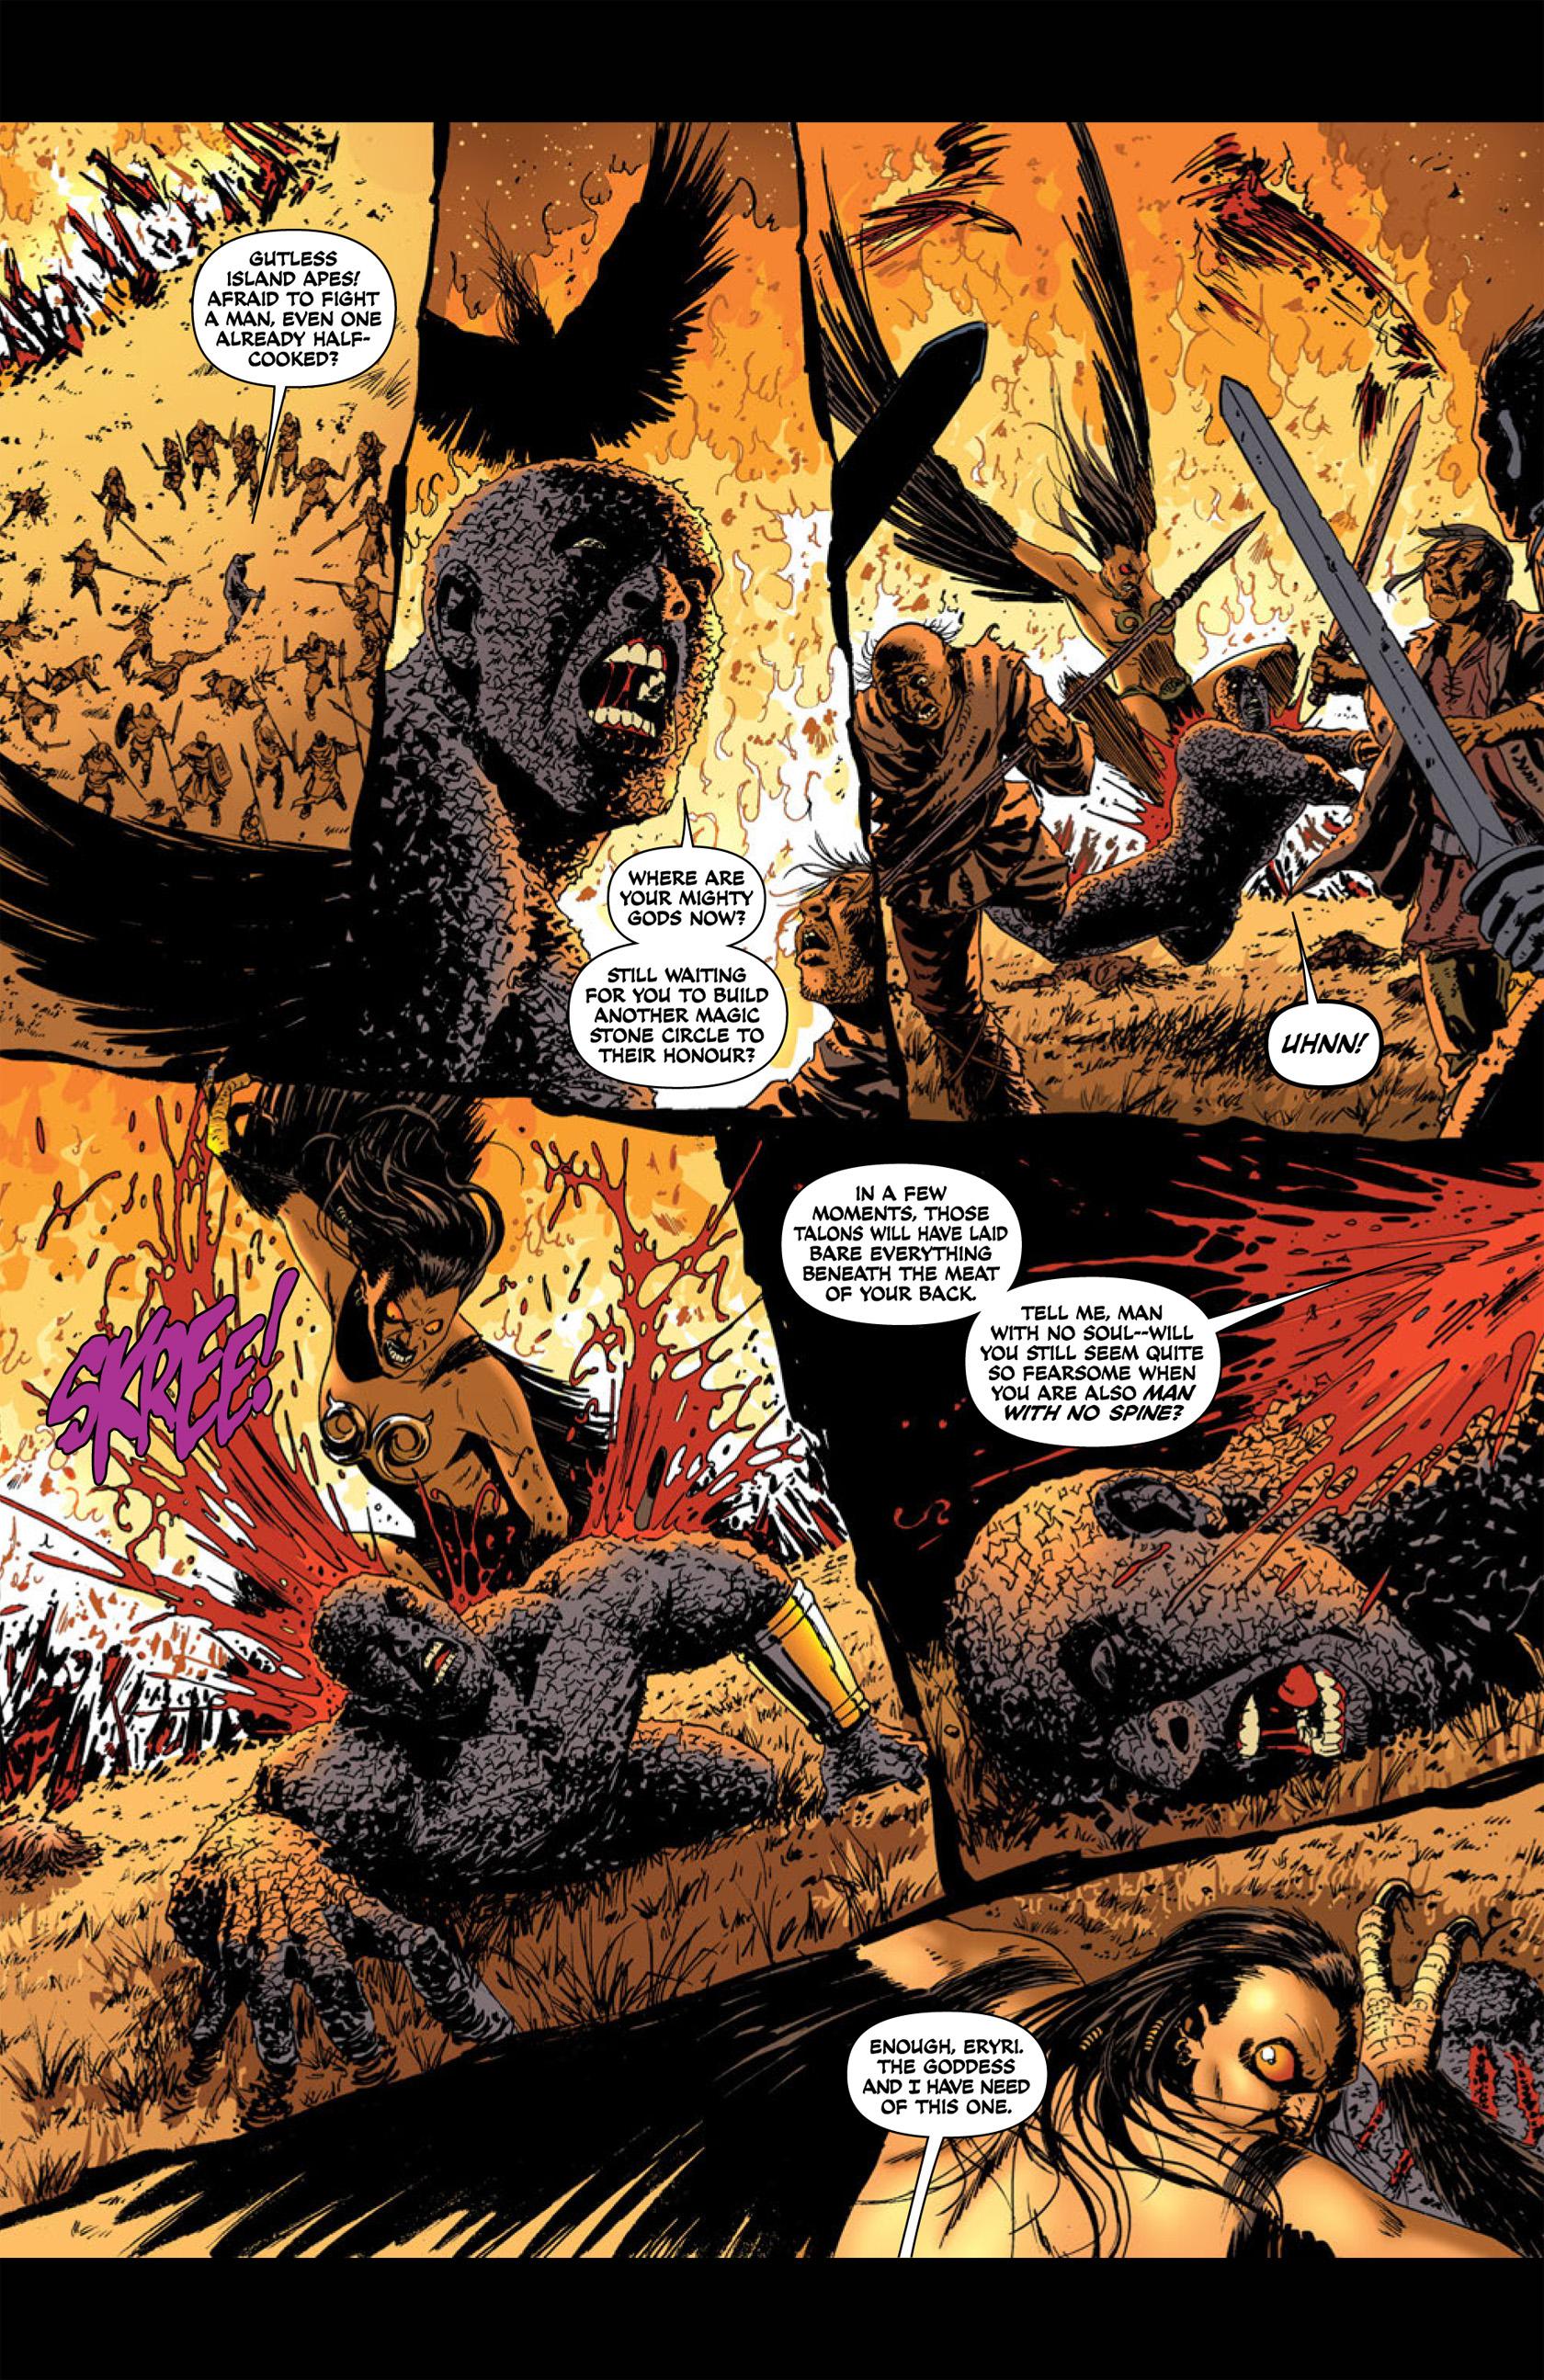 Read online Aquila comic -  Issue #1 - 17